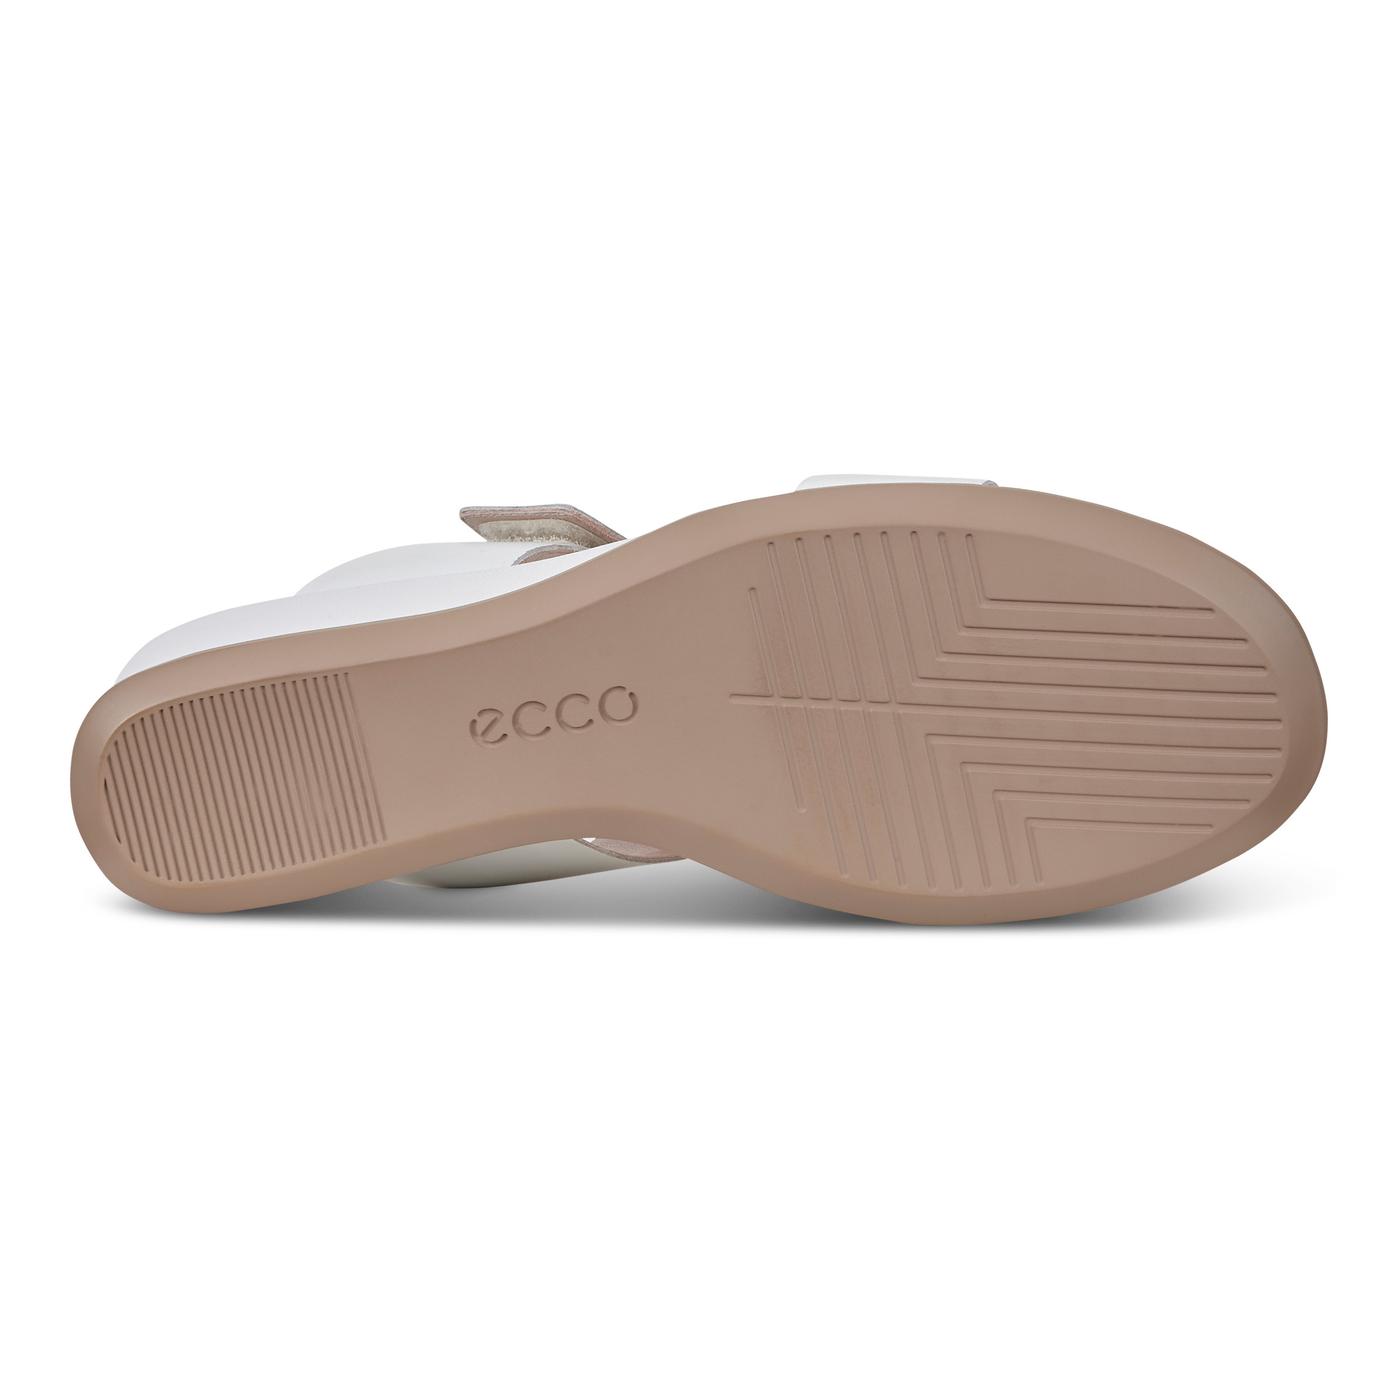 ECCO 여성 샌들 쉐이프 35 웨지 250103-01002